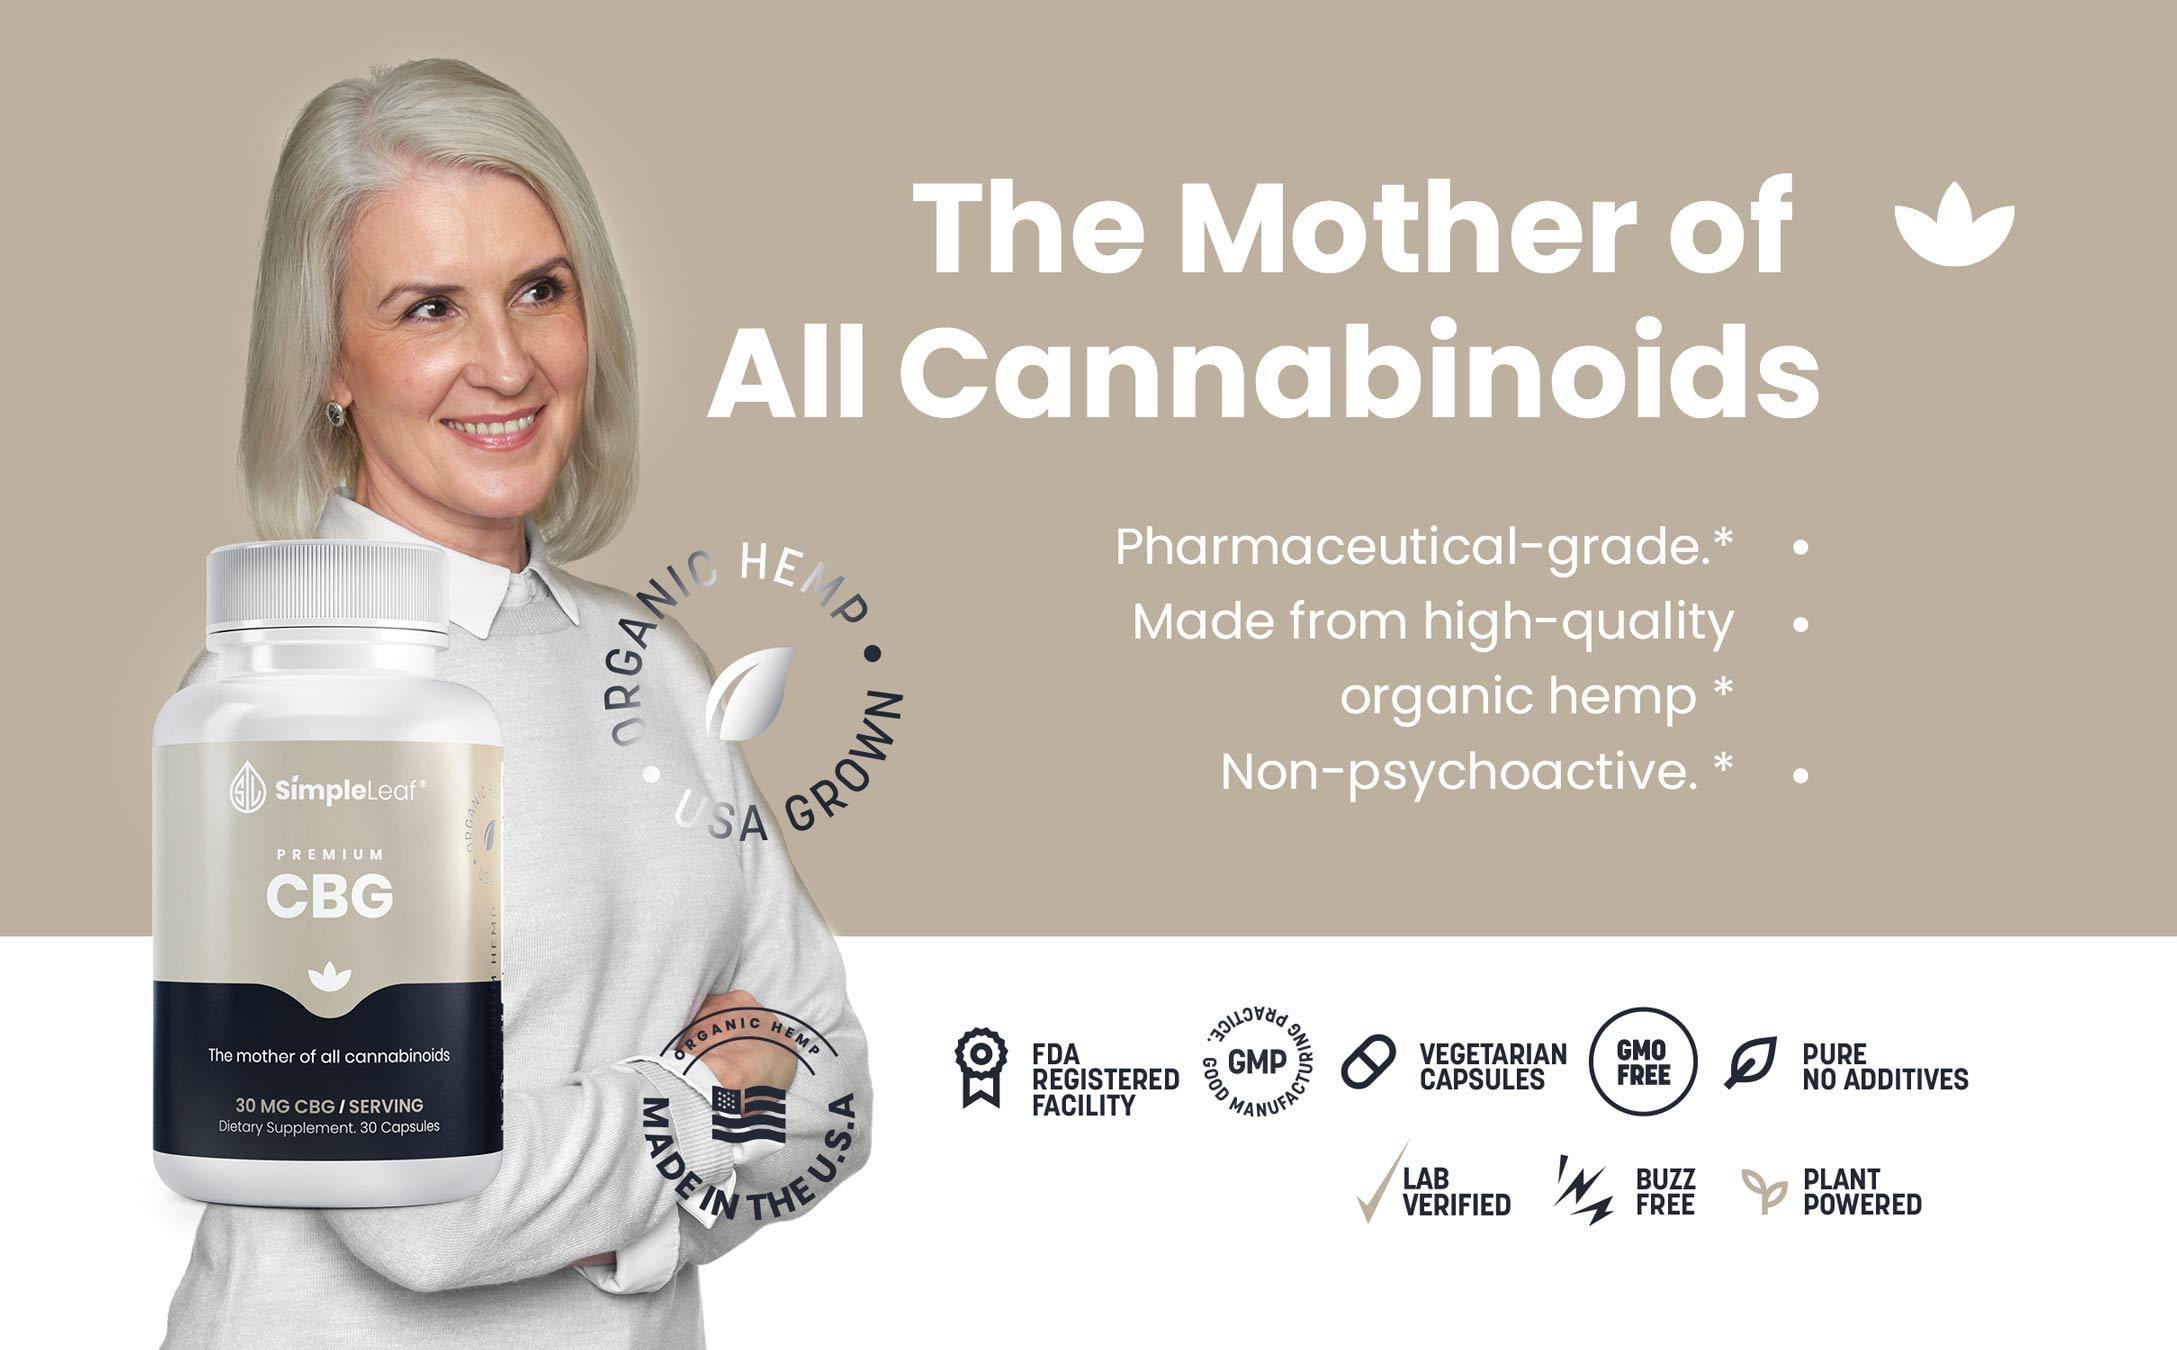 cbg, organic cbg, premium cbg, cannabigerol